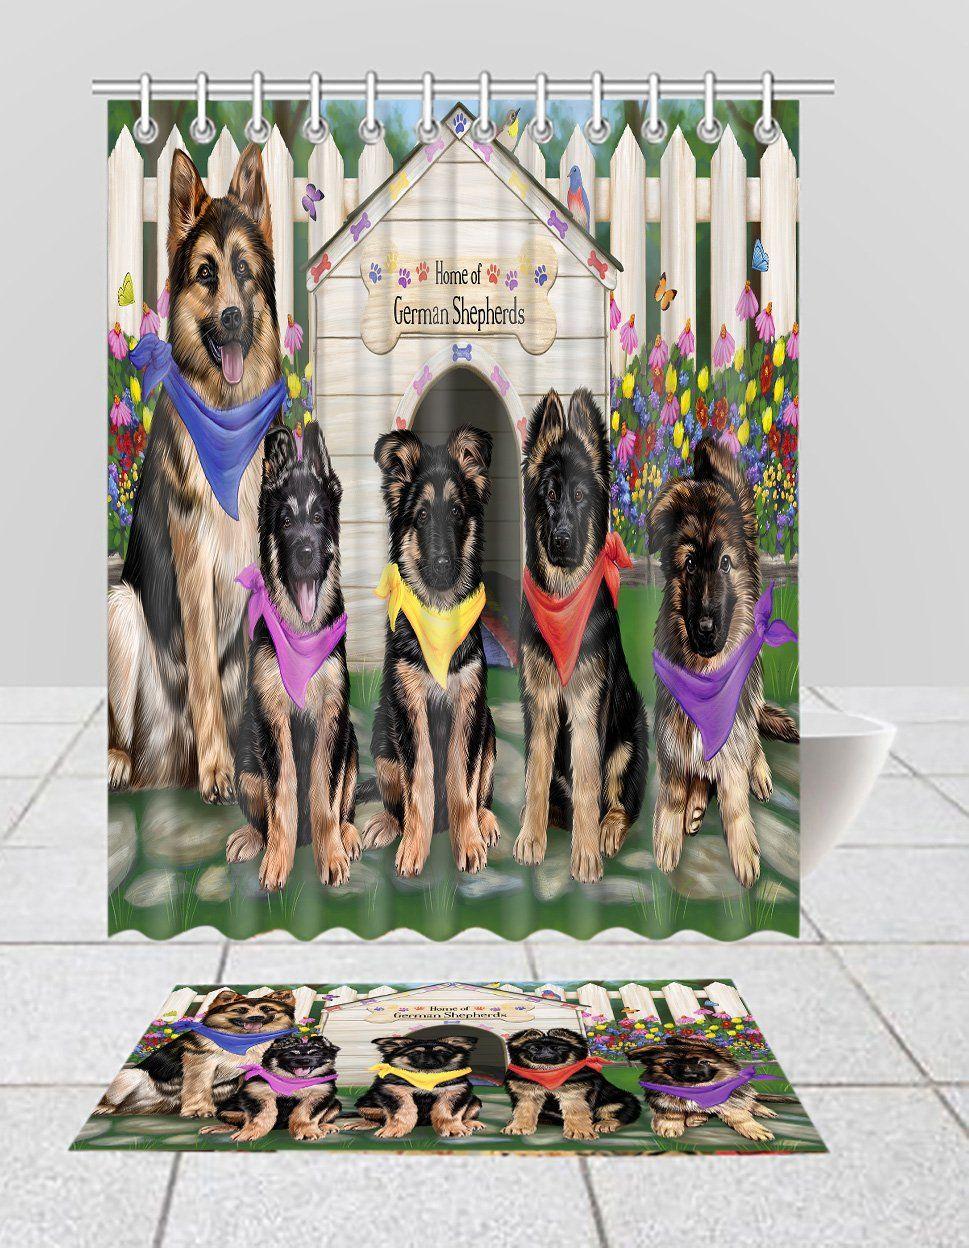 Spring Dog House German Shepherd Dogs Bath Mat And Shower Curtain